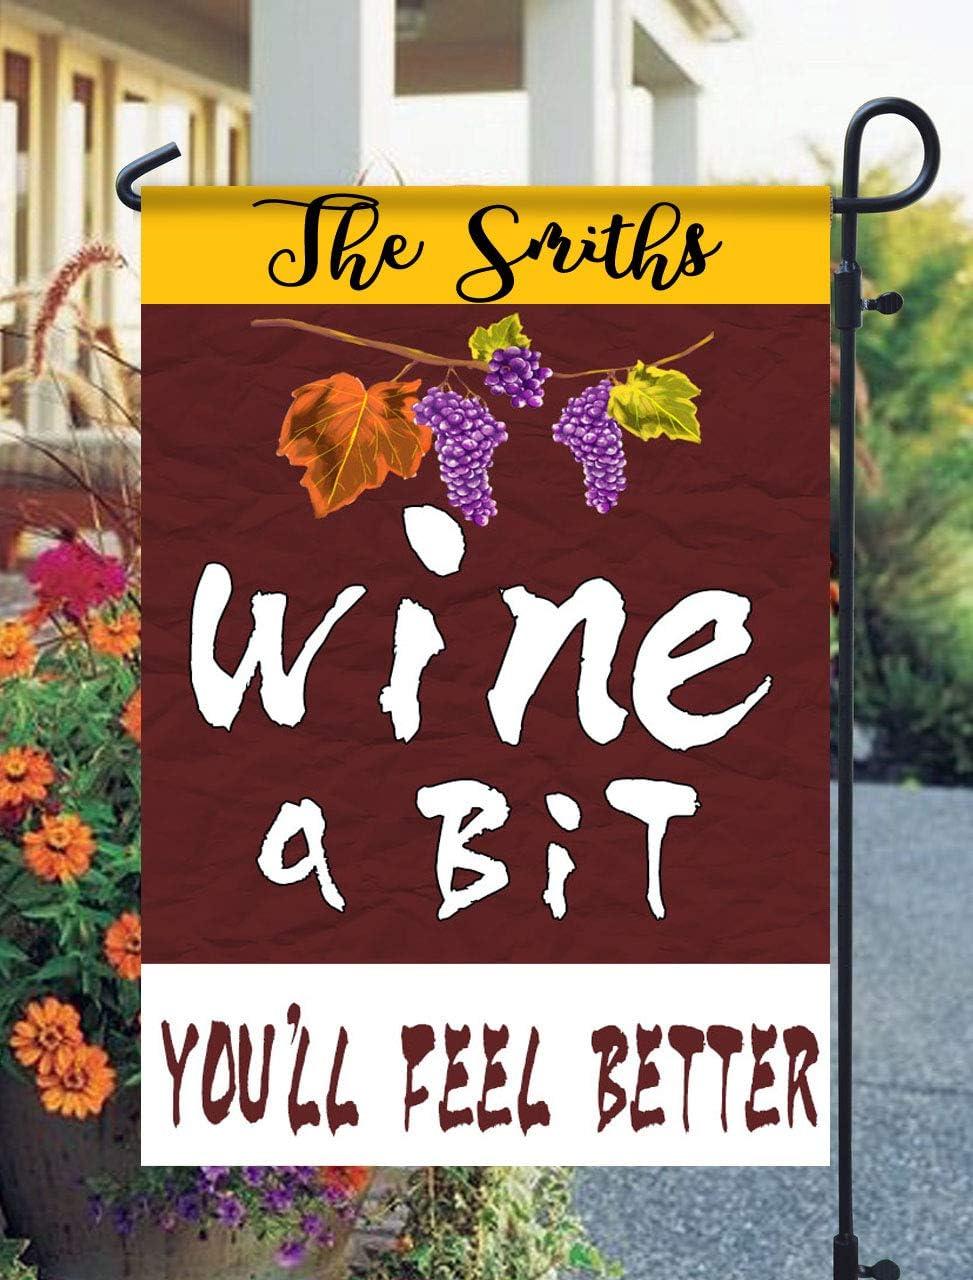 Tow Yus Dala Polyester Garden Flag for House Decor-Wine a bit youll Feel Better